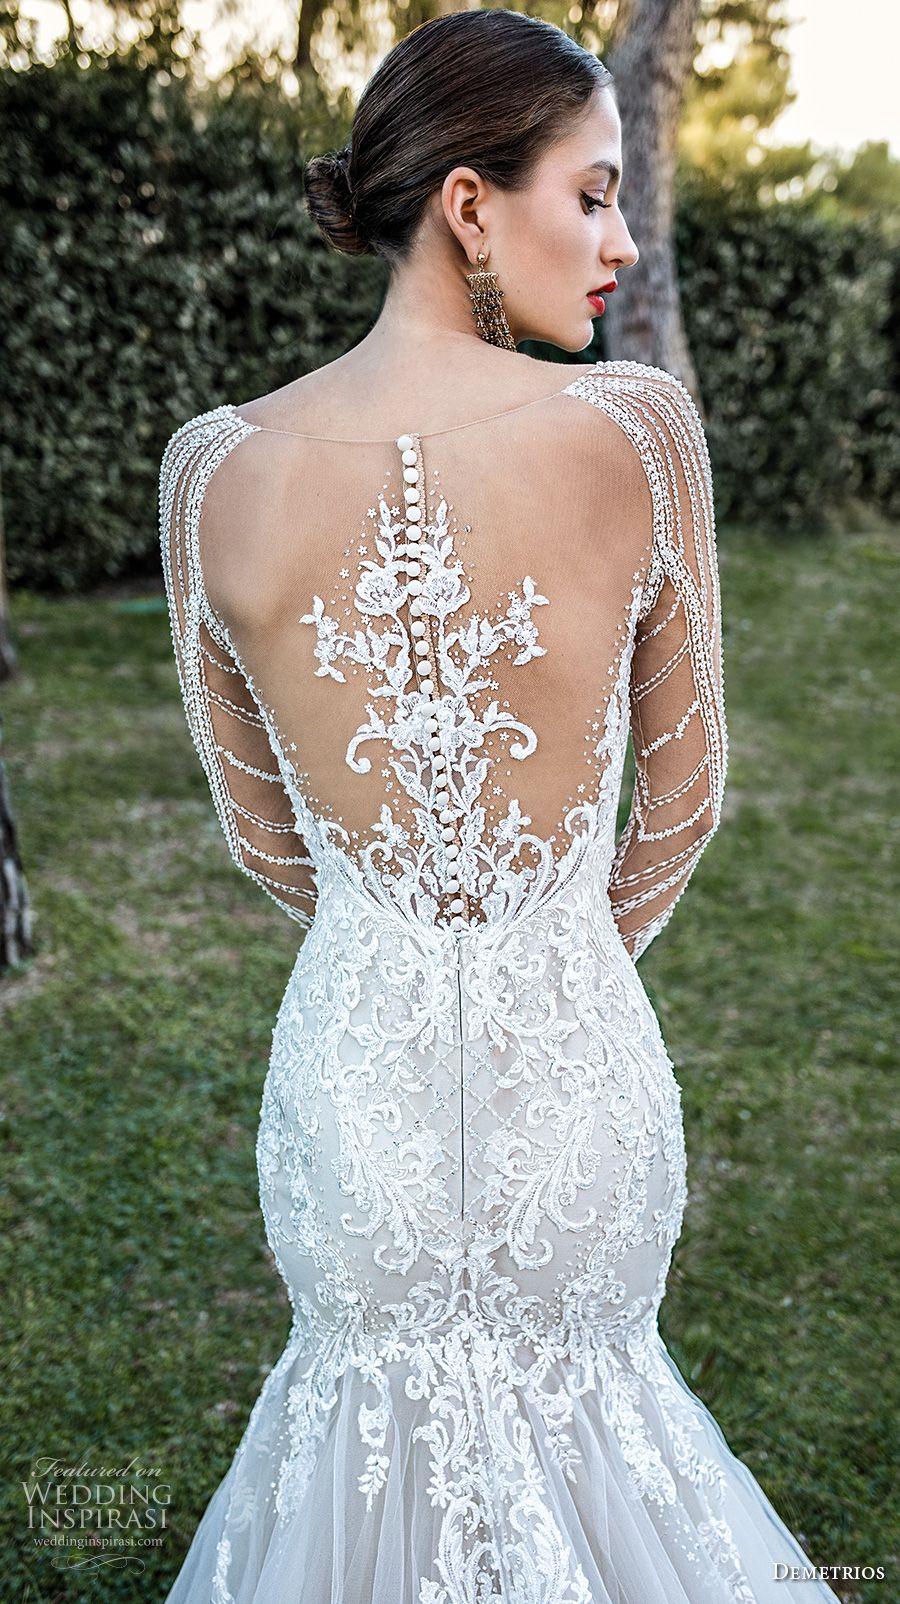 Demetrios Capsule 2020 Wedding Dresses Sophistique Bridal Collection Wedding Inspirasi Wedding Dresses Sweetheart Neckline Wedding Dresses Wedding Dresses Lace [ 1604 x 900 Pixel ]